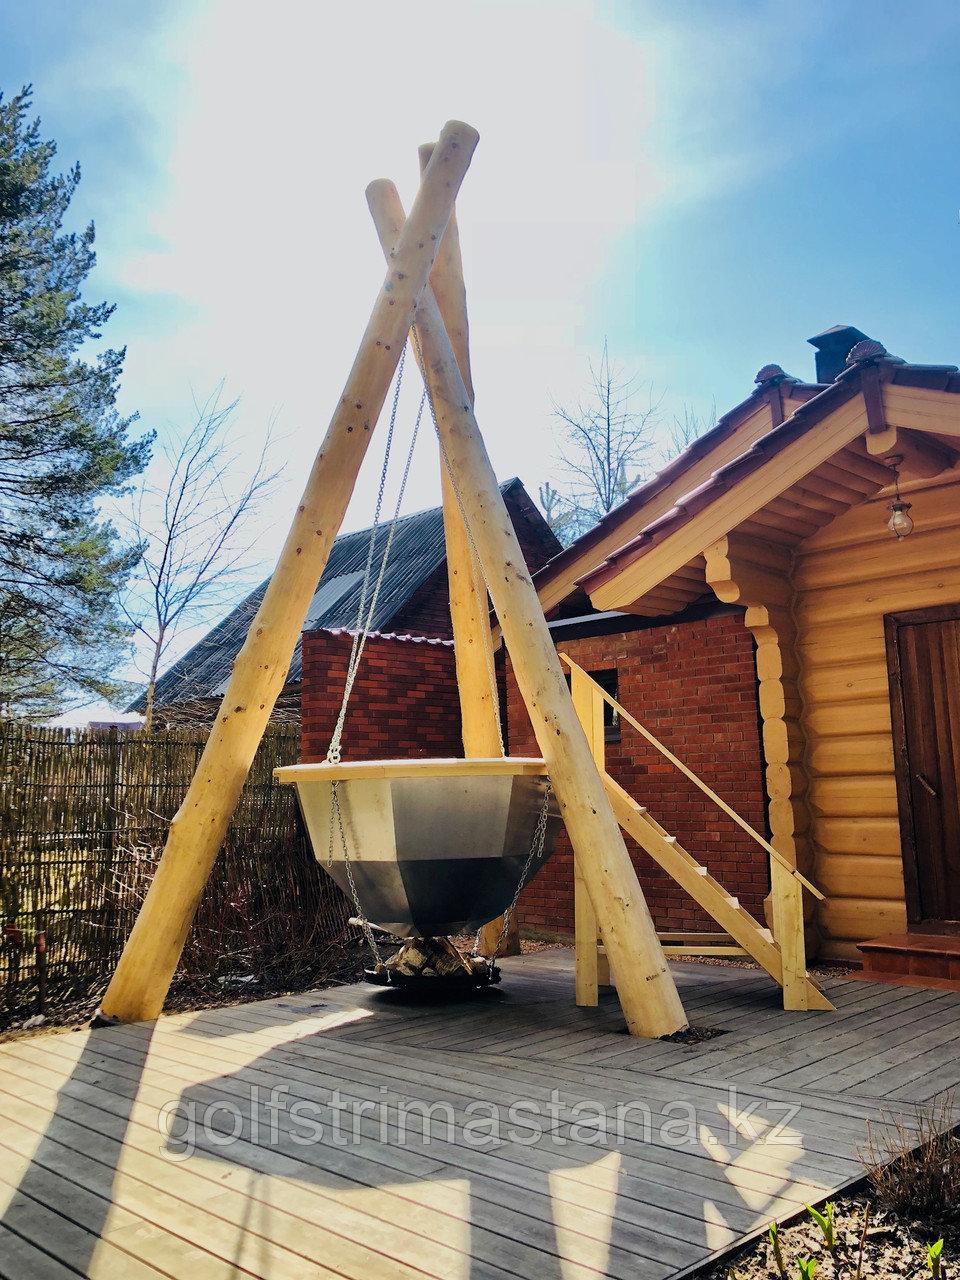 Сибирский Банный Чан, (в*д: 110*165/0,2 см., AISI-430), На бревнах, без печи